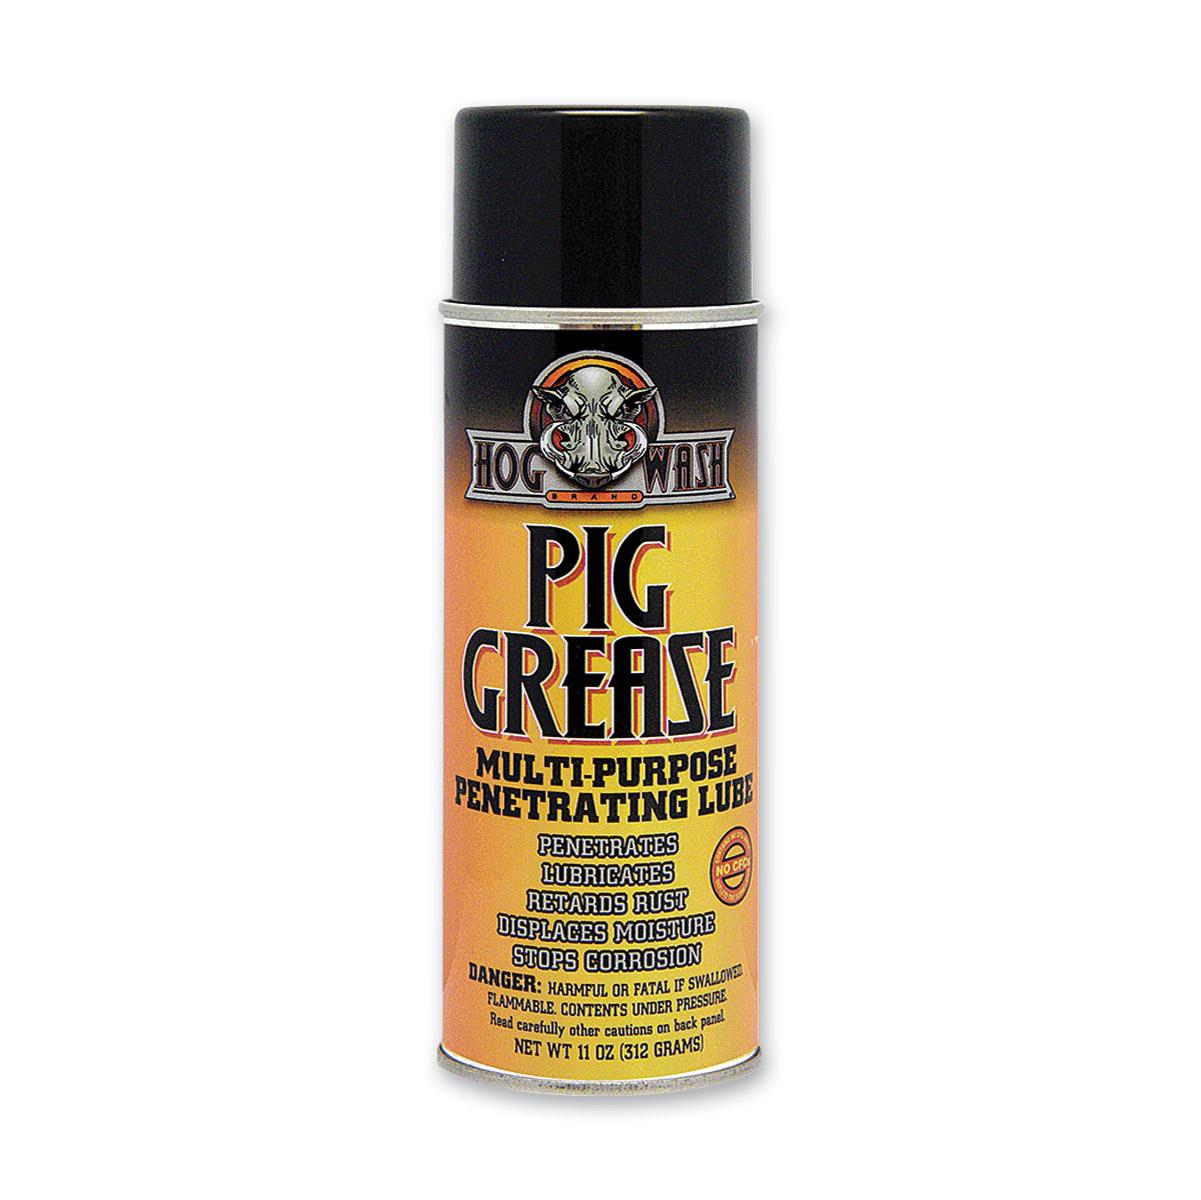 Hog Wash Pig Grease